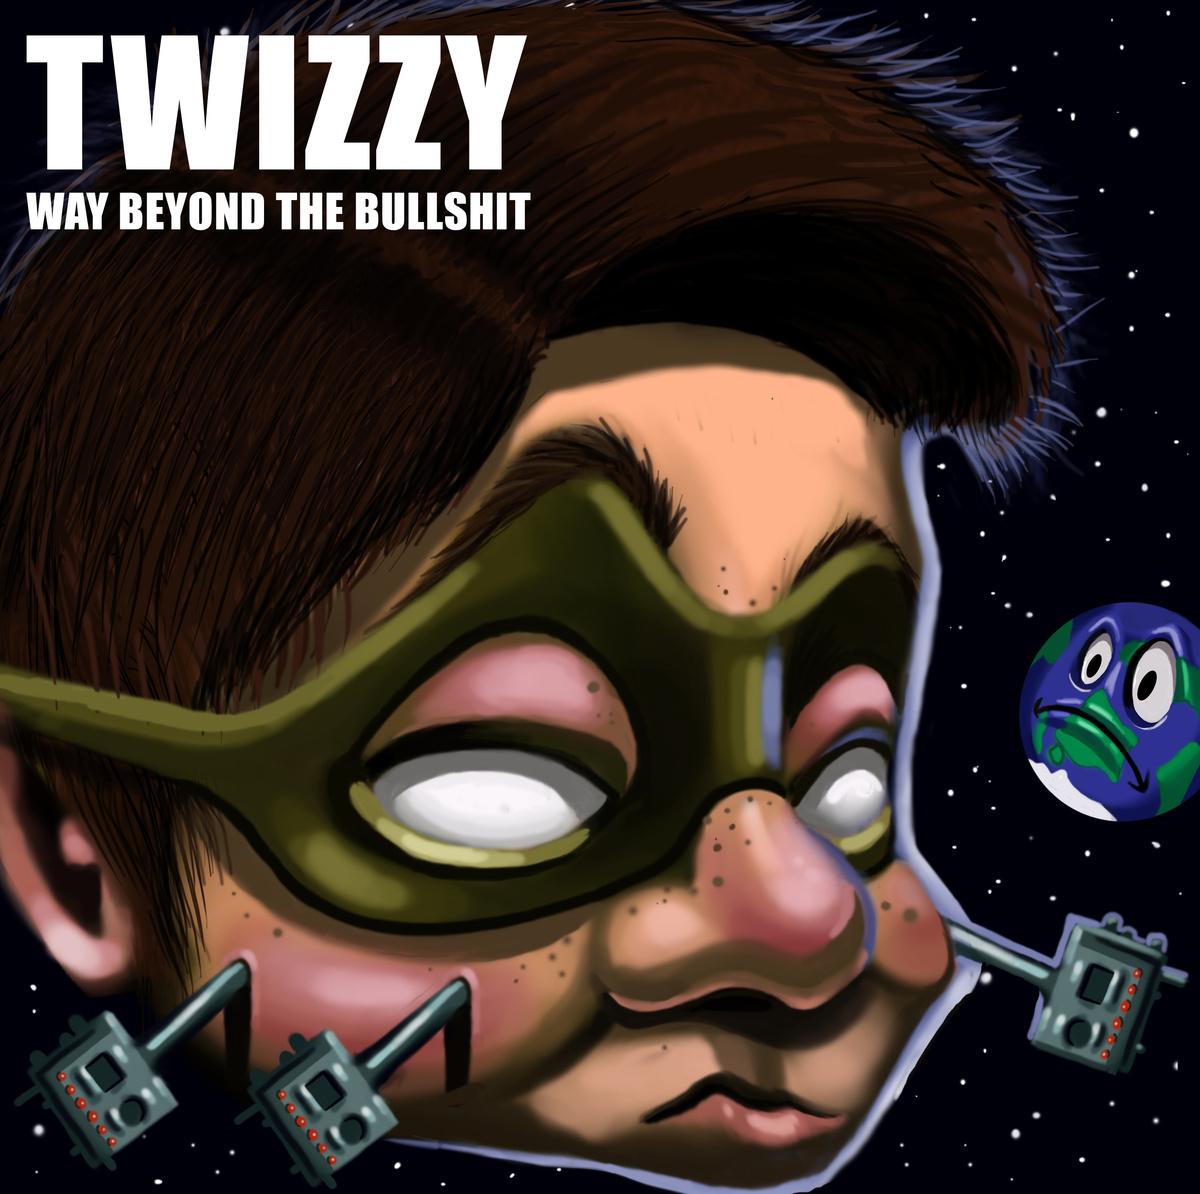 Twizzy - Way Beyond The Bullshit